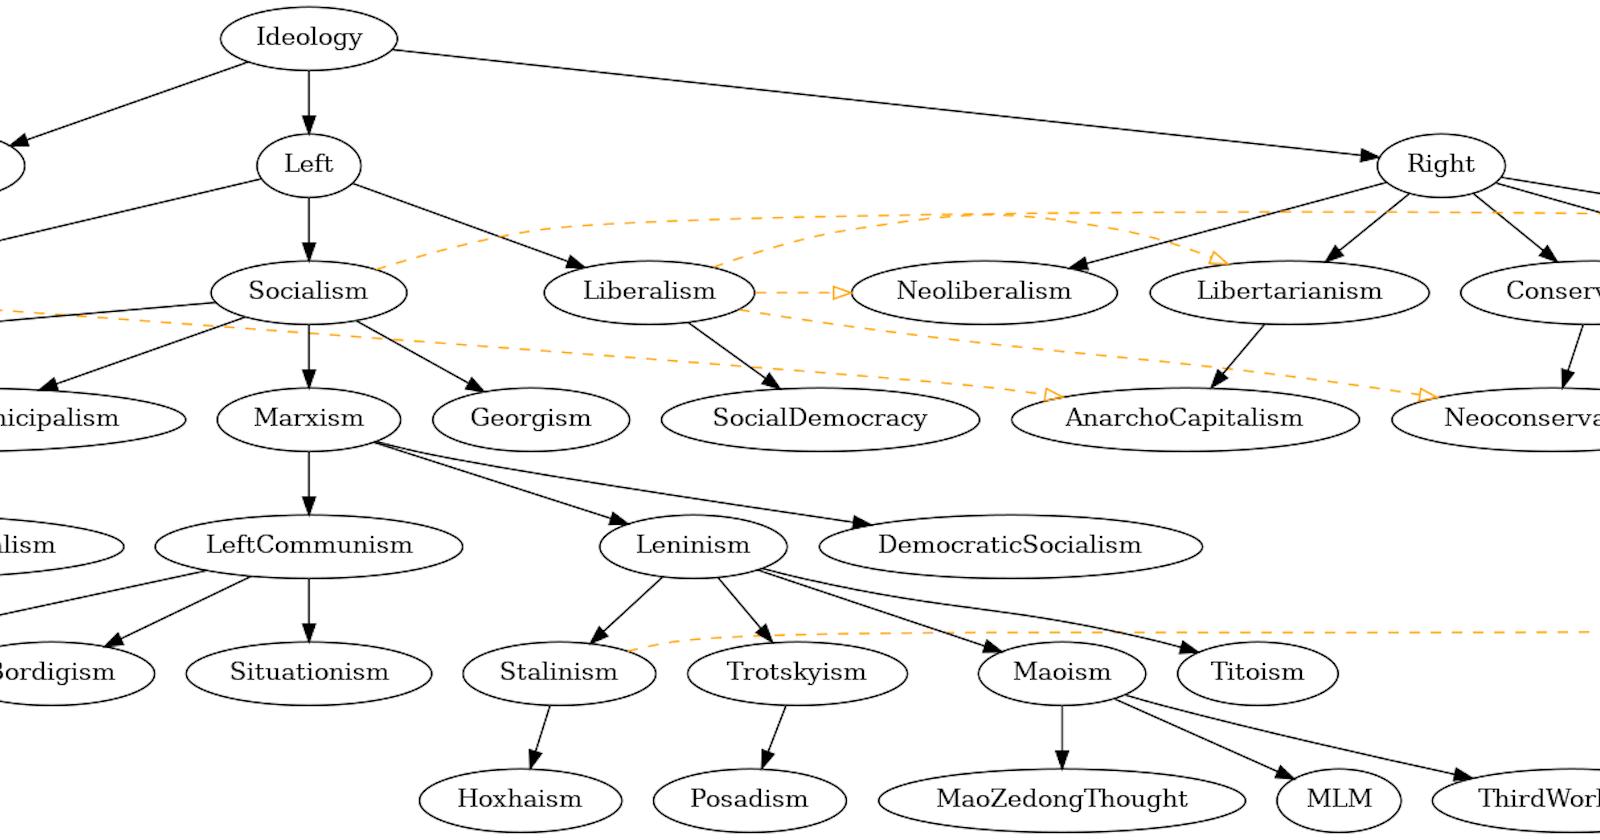 Creating tree graphs with graphviz